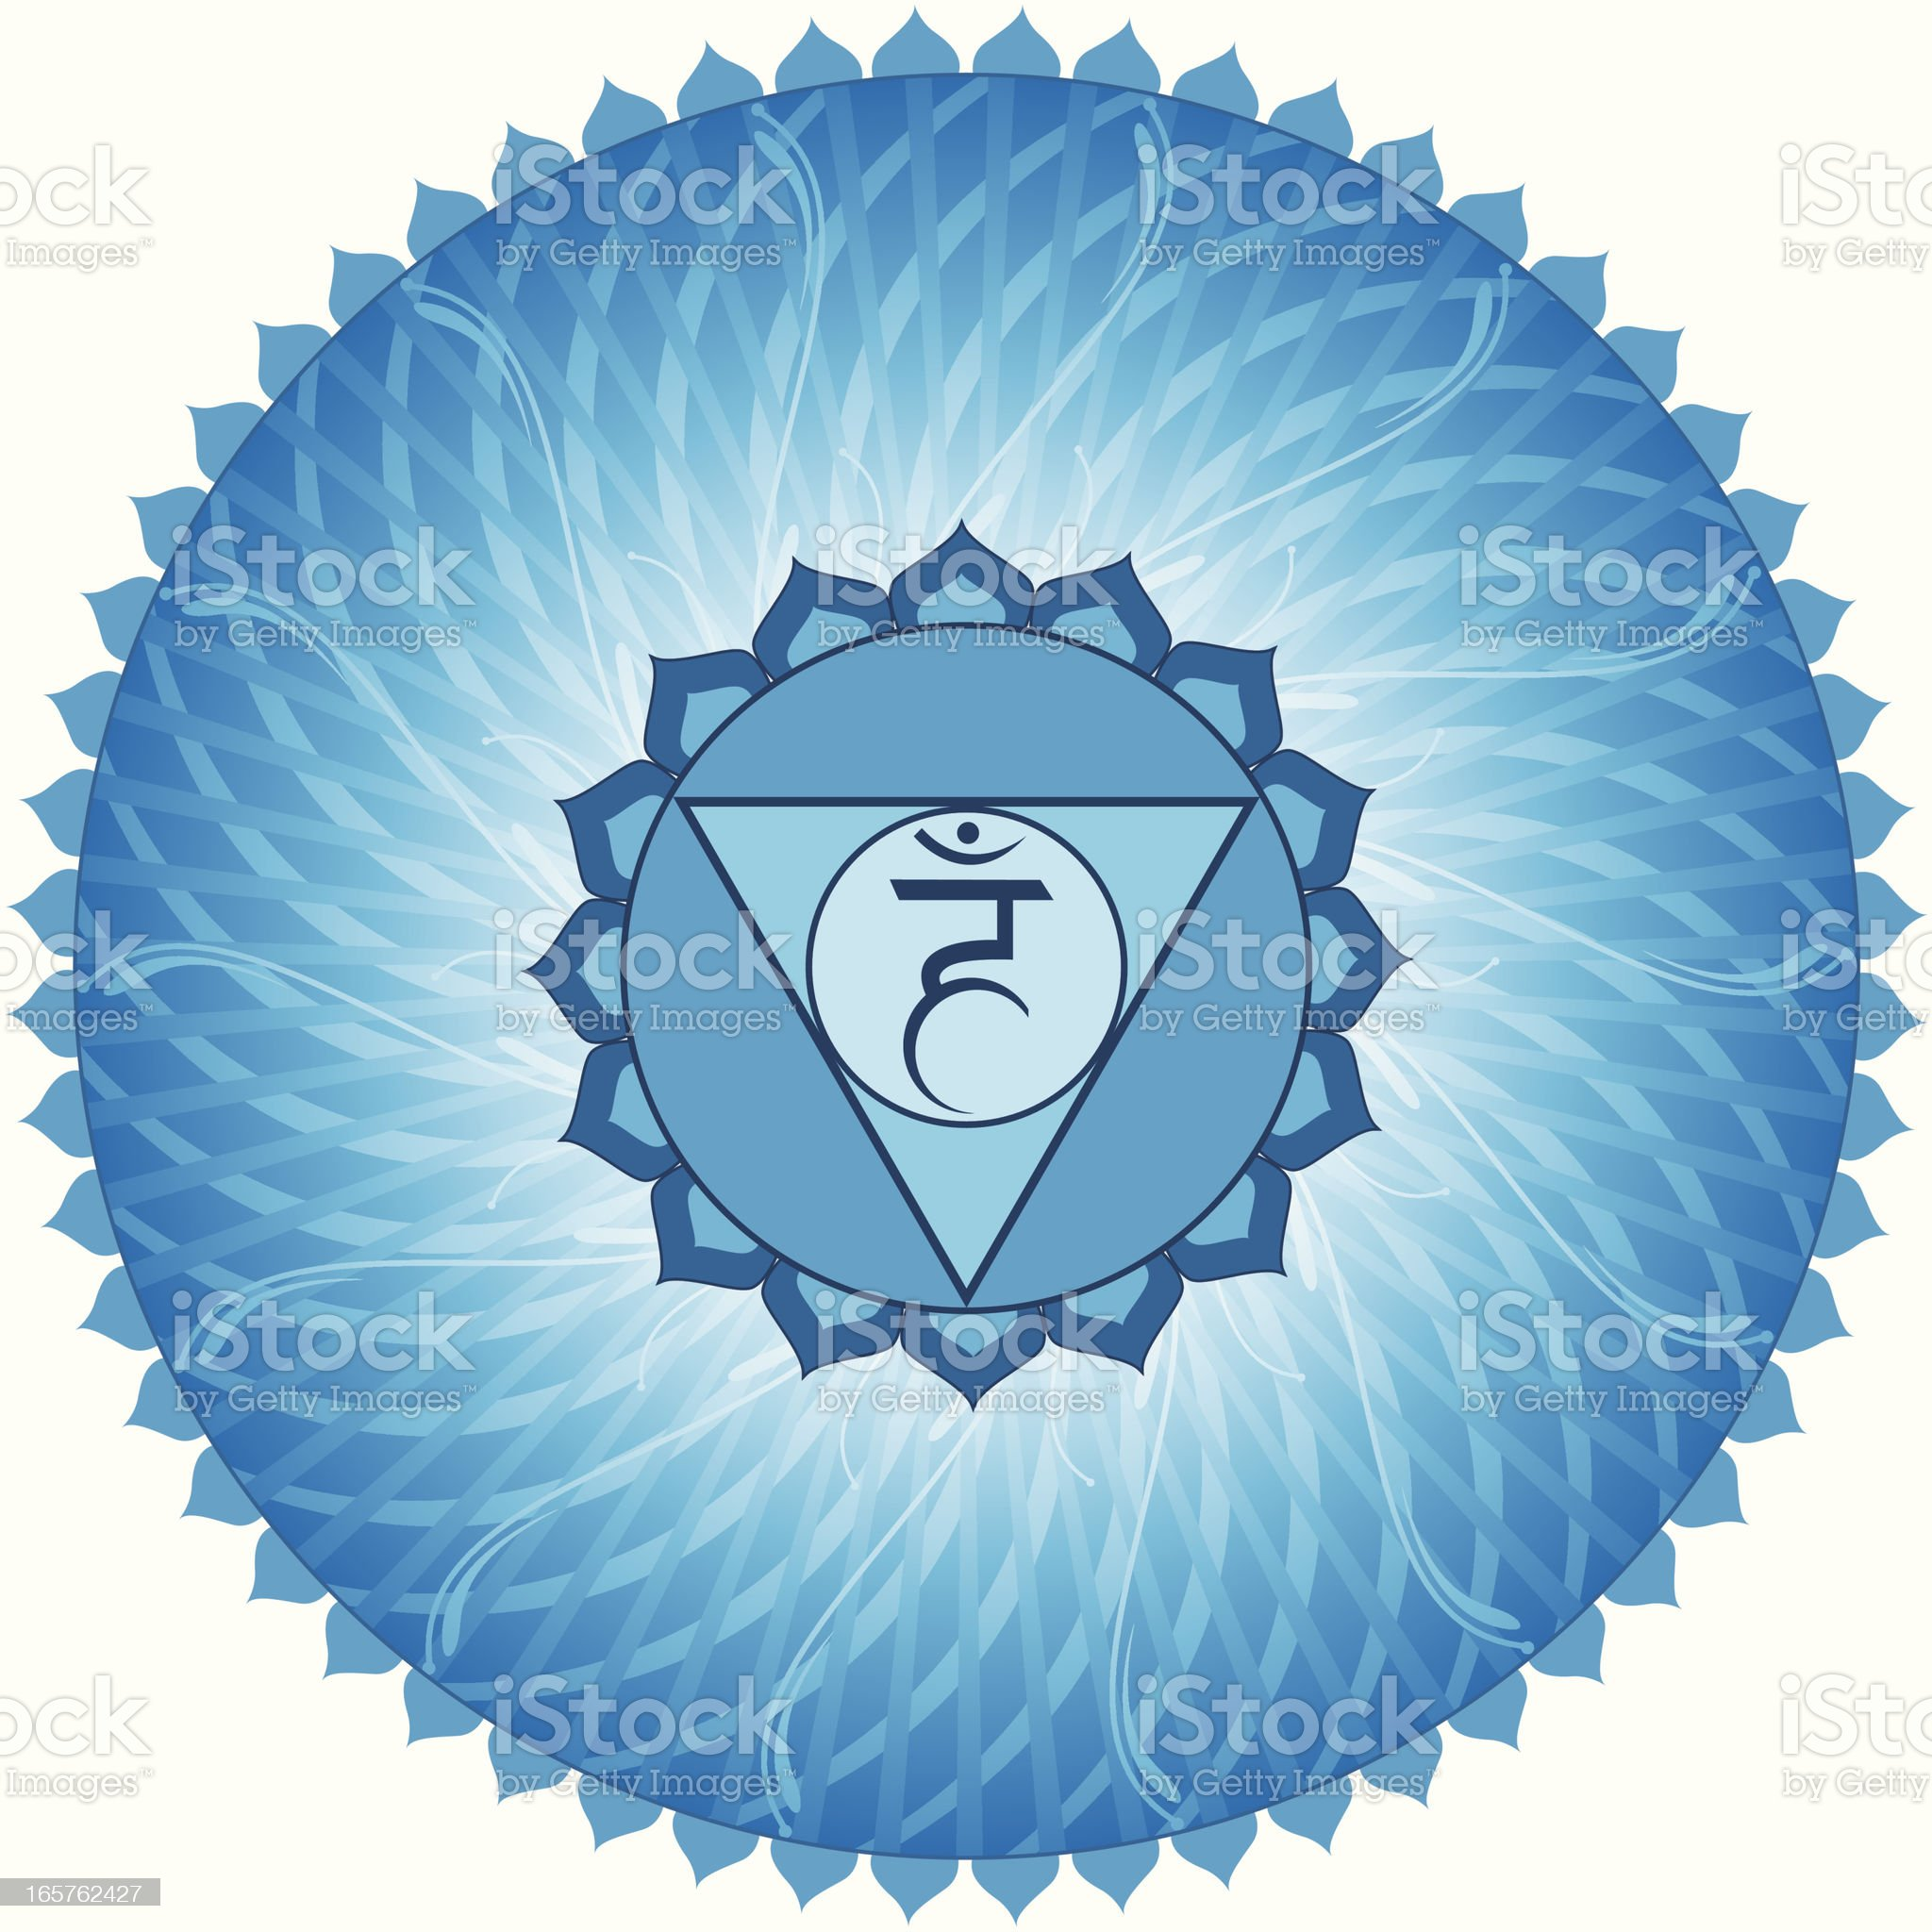 Vishuddha Chakra royalty-free stock vector art